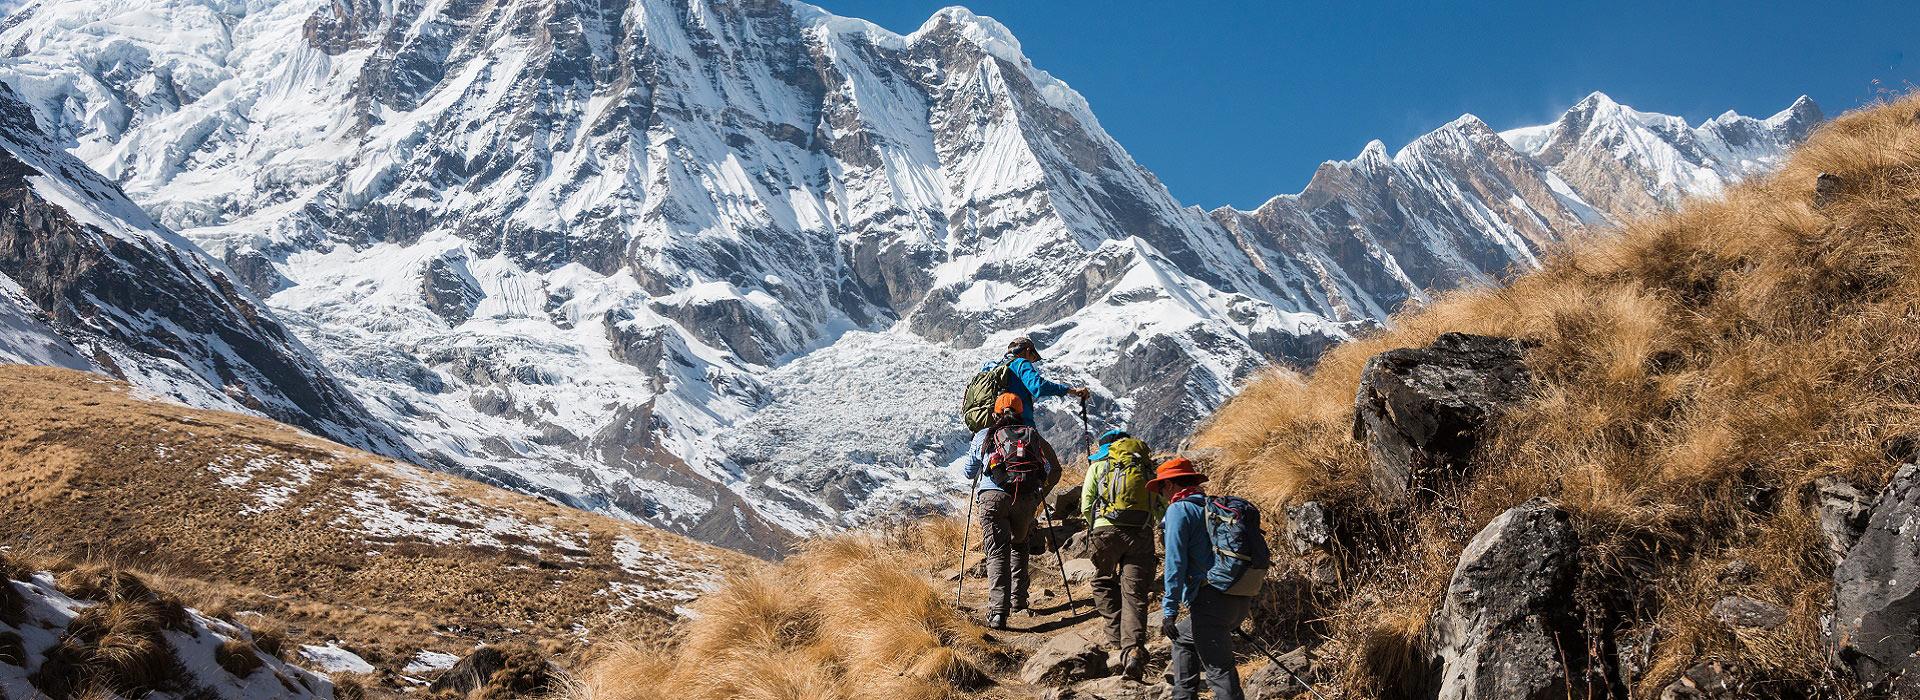 trekking_in_annapurna_region_nepal